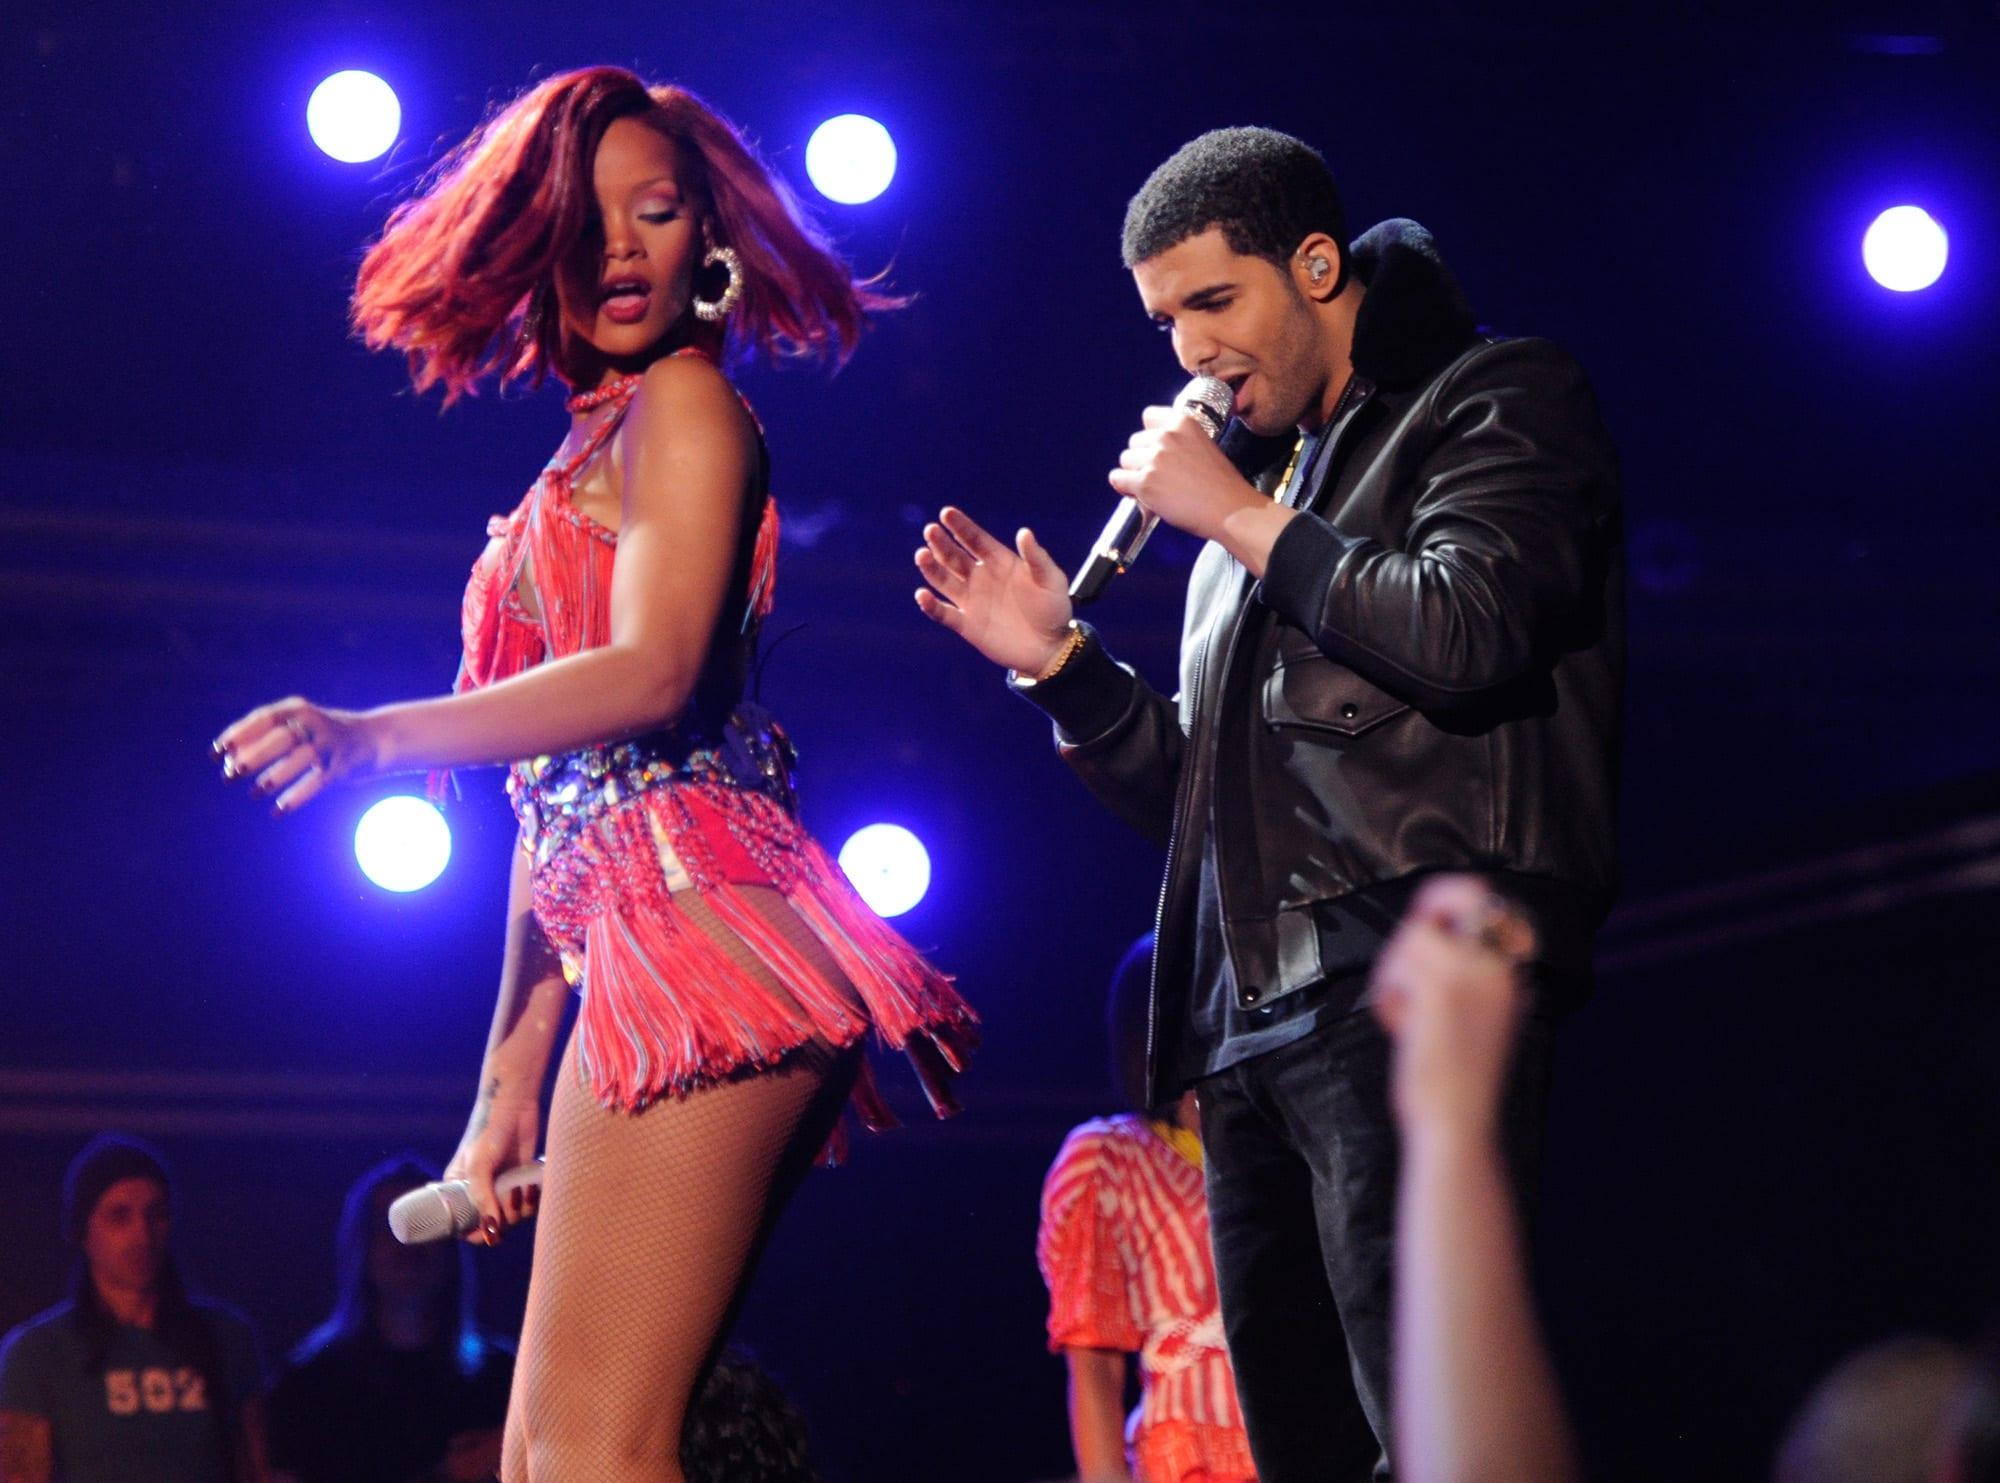 Why Did Drake and Rihanna Break Up?